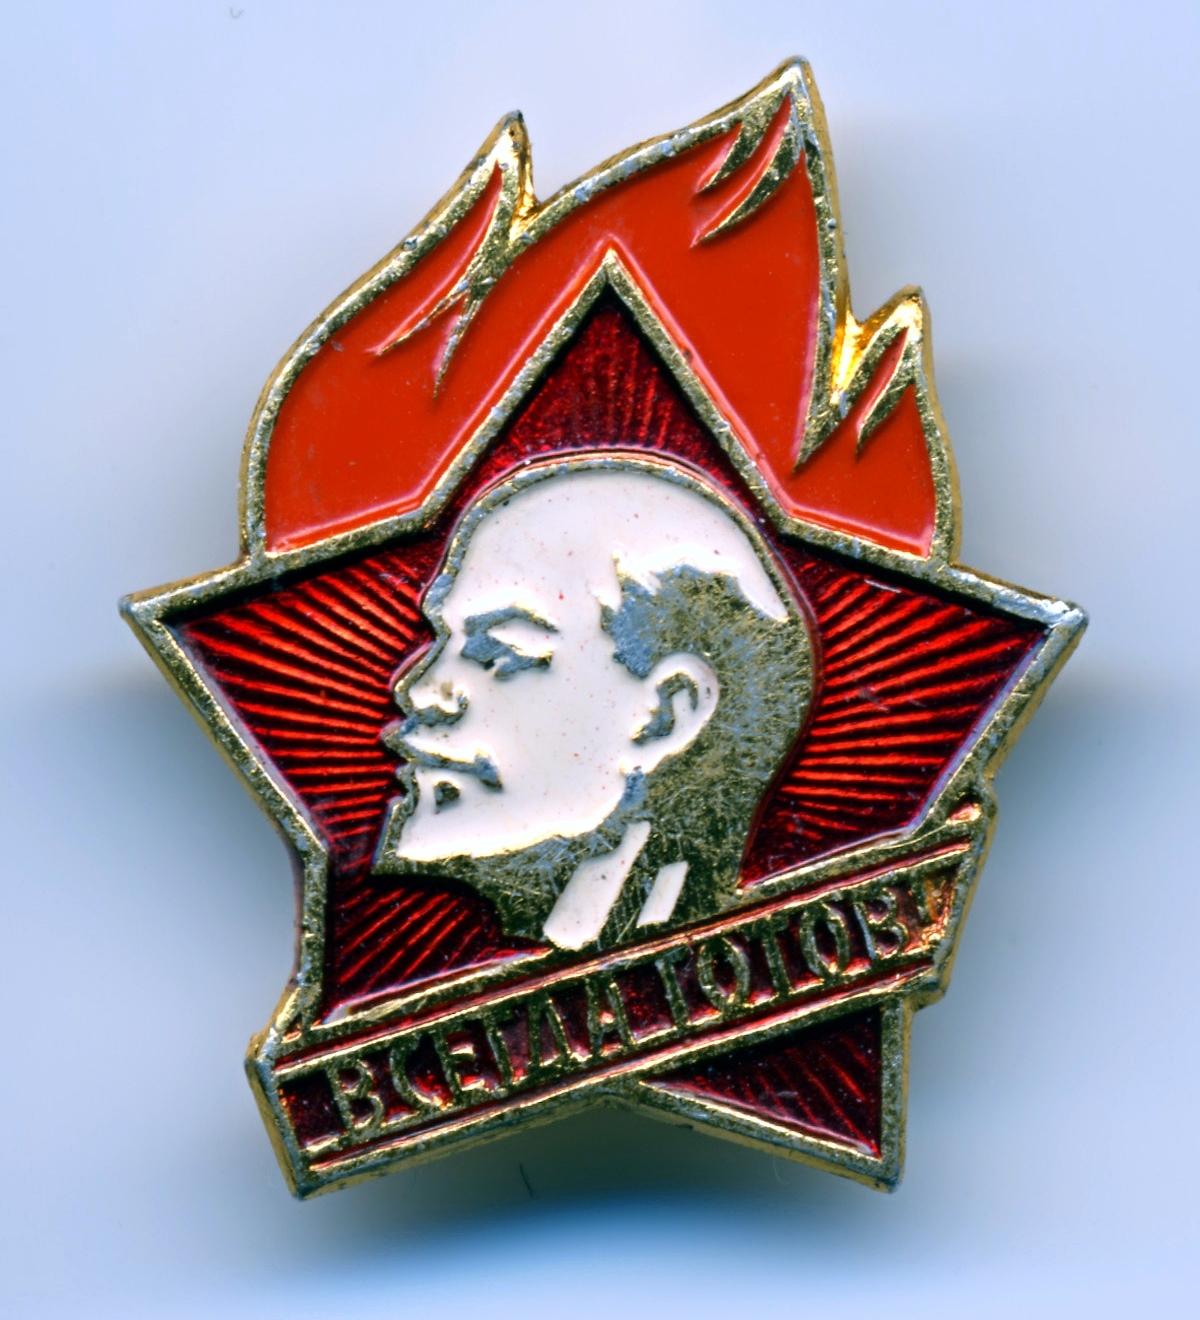 00 soviet pioneers 04. 25.05.14